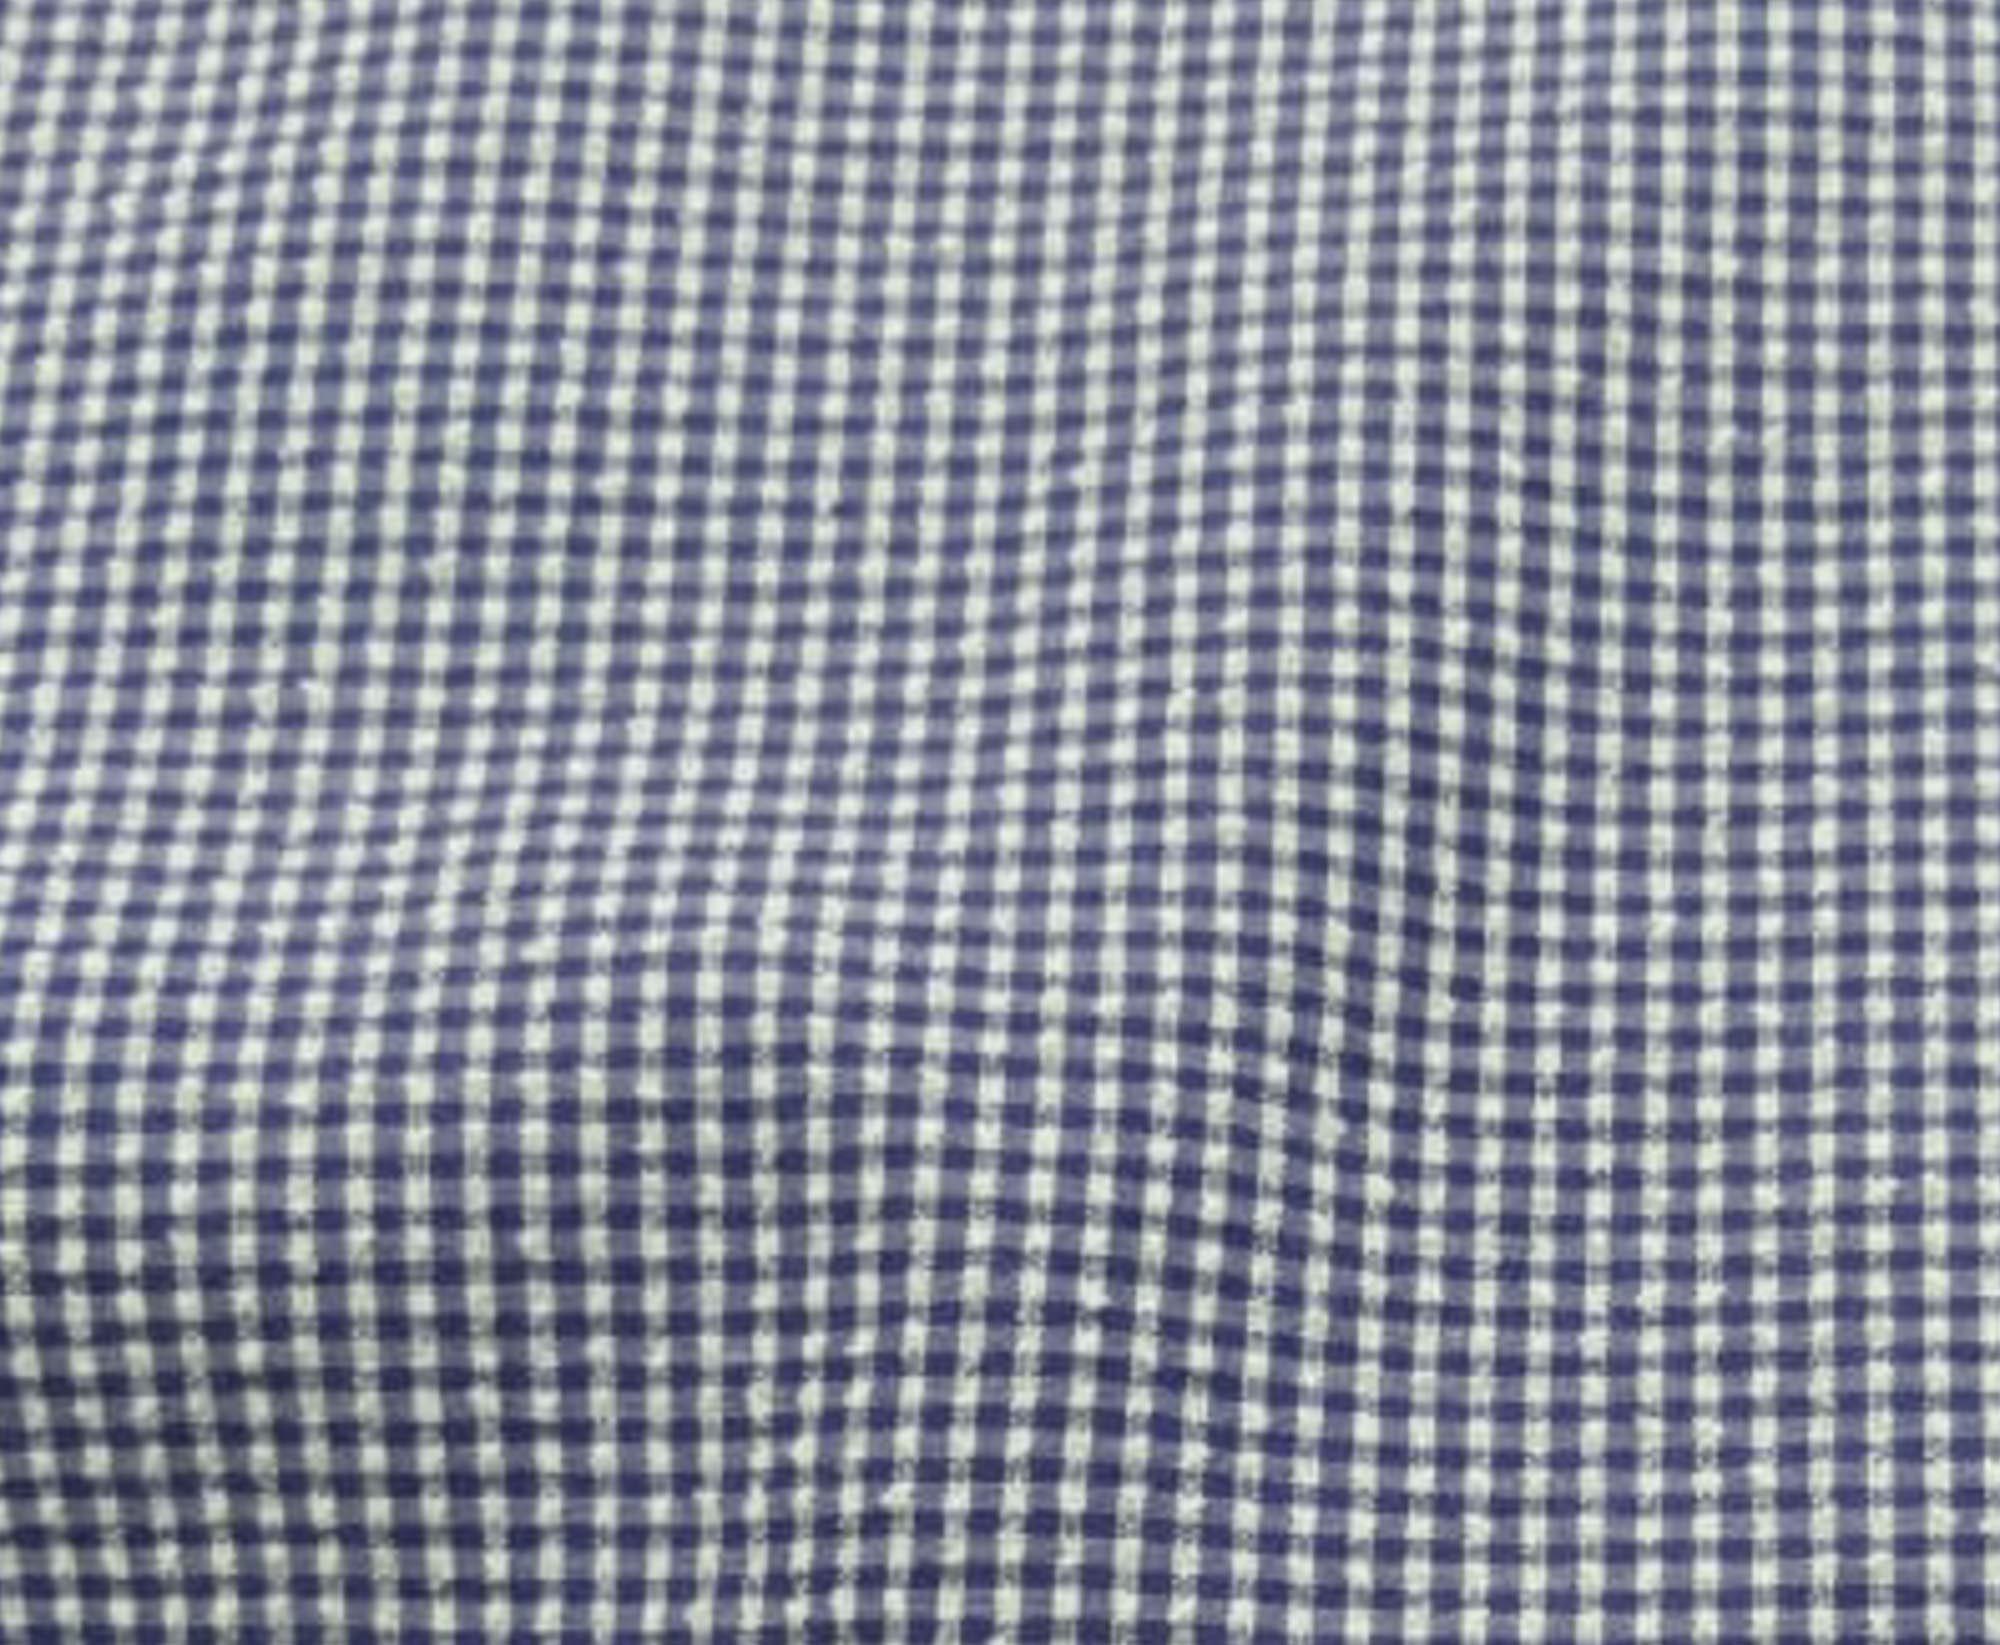 Tecido Anarruga Xadrez Azul Royal 100% Algodão 1,40 m Largura